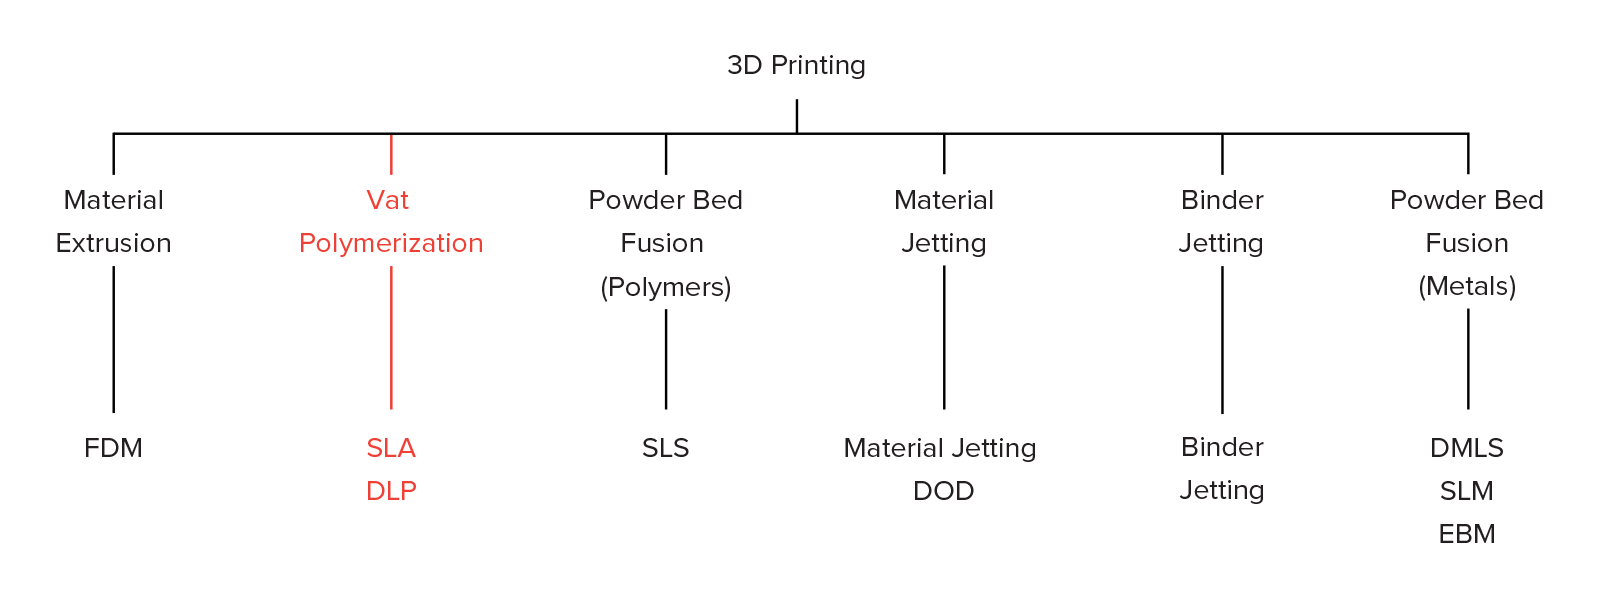 https://s3-eu-west-1.amazonaws.com/3dhubs-knowledgebase/introduction-sla-3d-printing/3-sla-tree.png